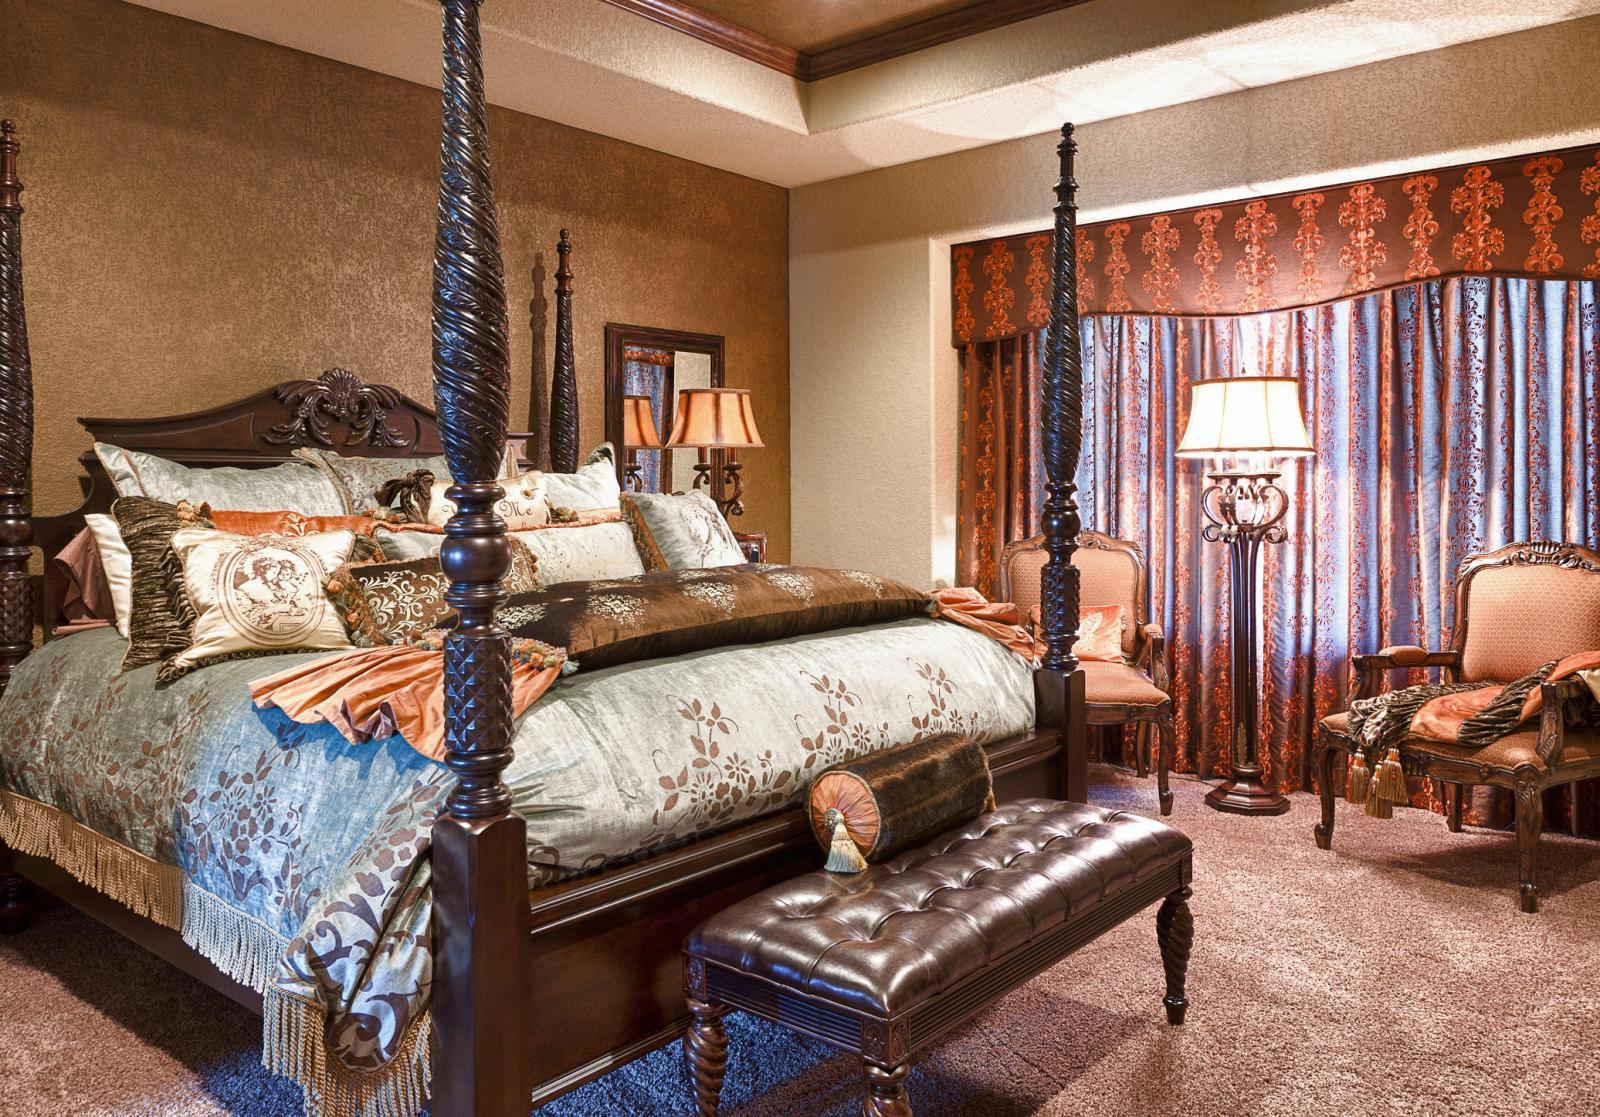 Master Bedroom with a designer feel